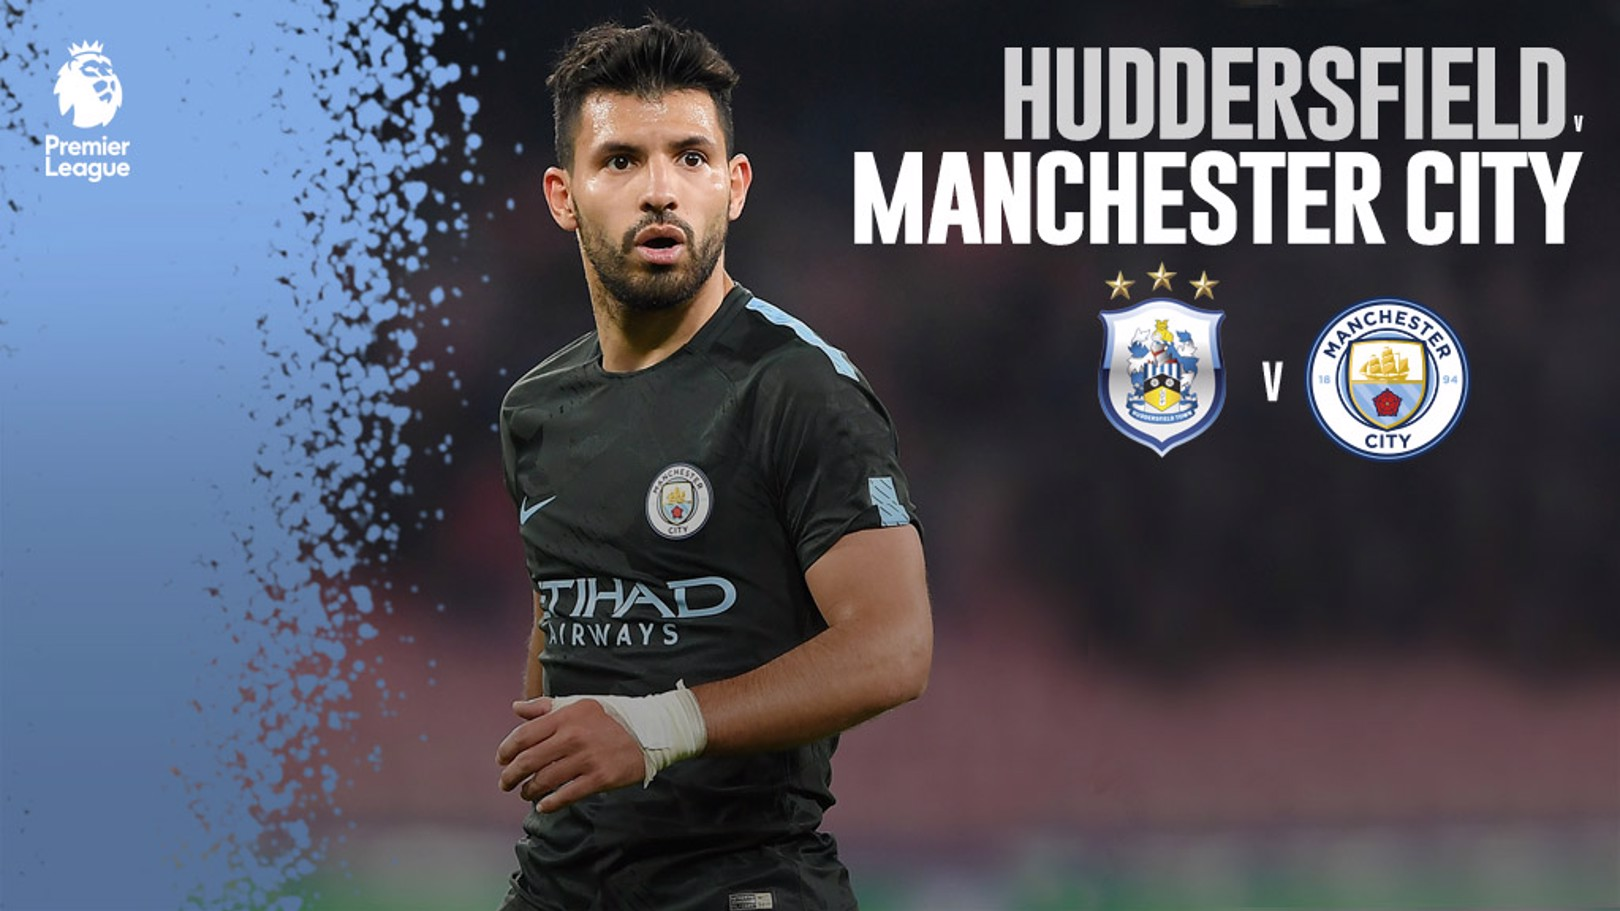 HUDDERSFIELD - CITY. Decimotercera jornada de la Premier League.